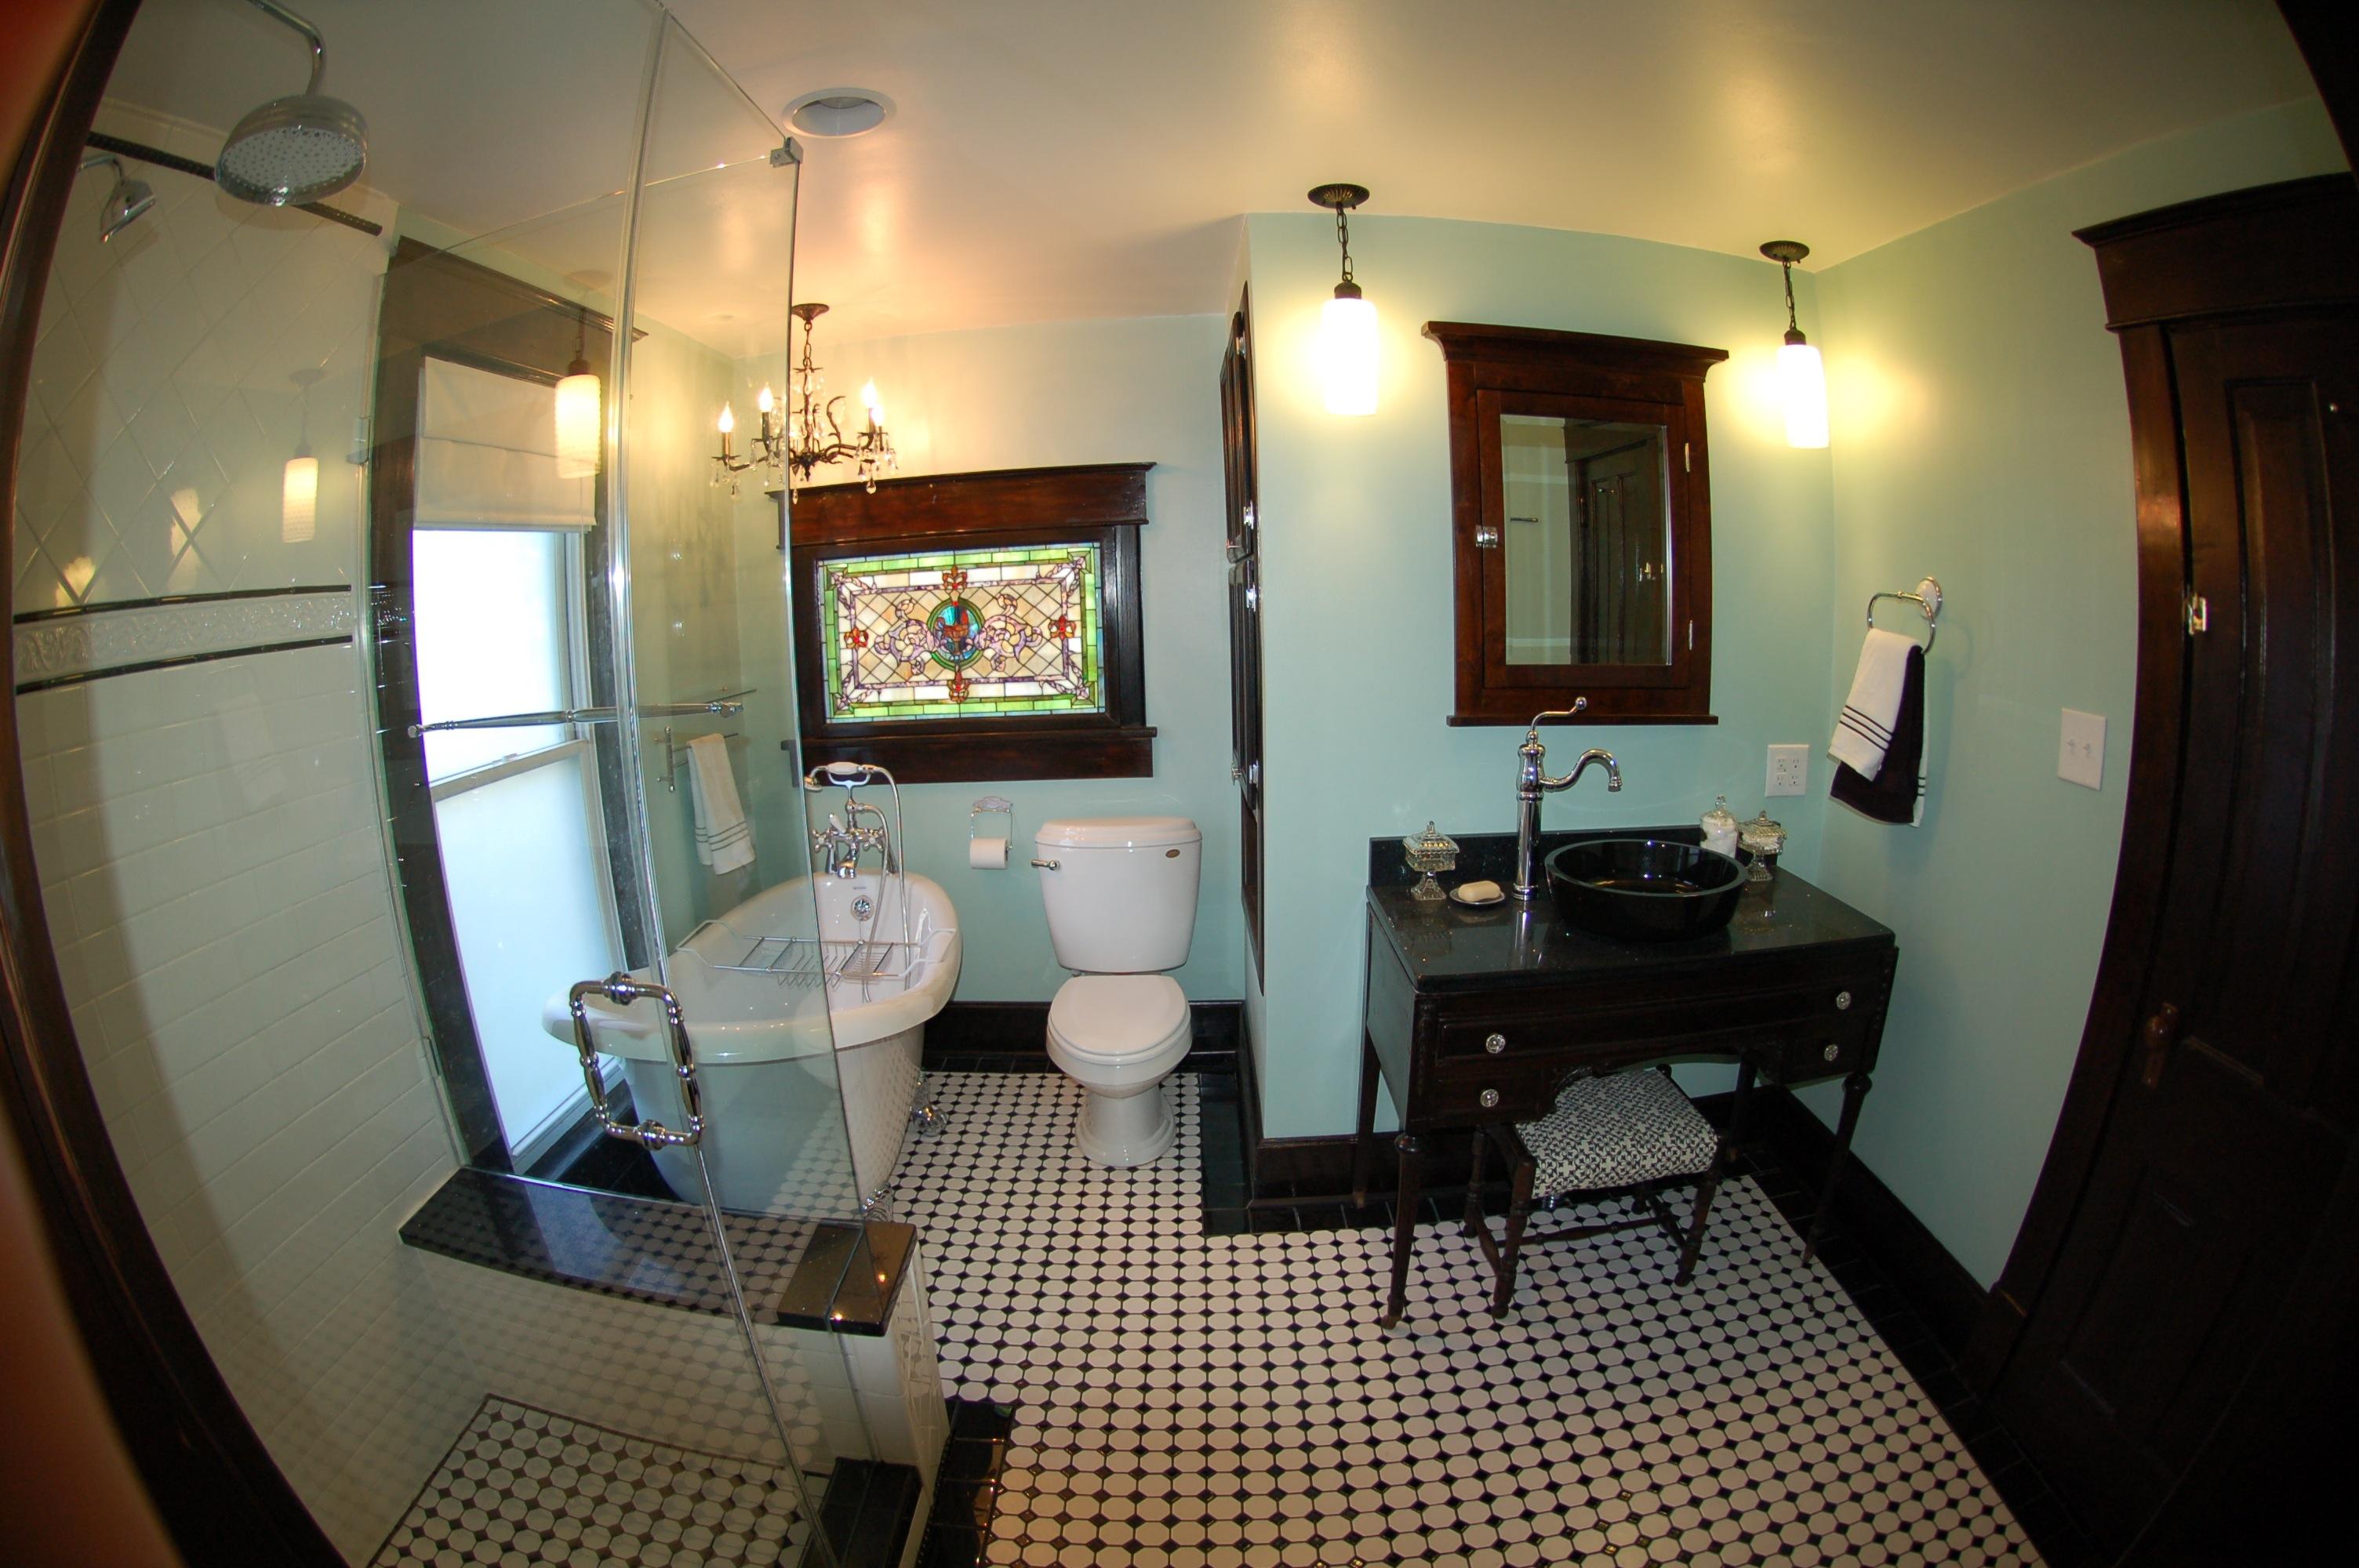 Guest Bath Final Blog Post26. I Wish This Were Mine   The Cottage Bathroom Complete   Vivacious